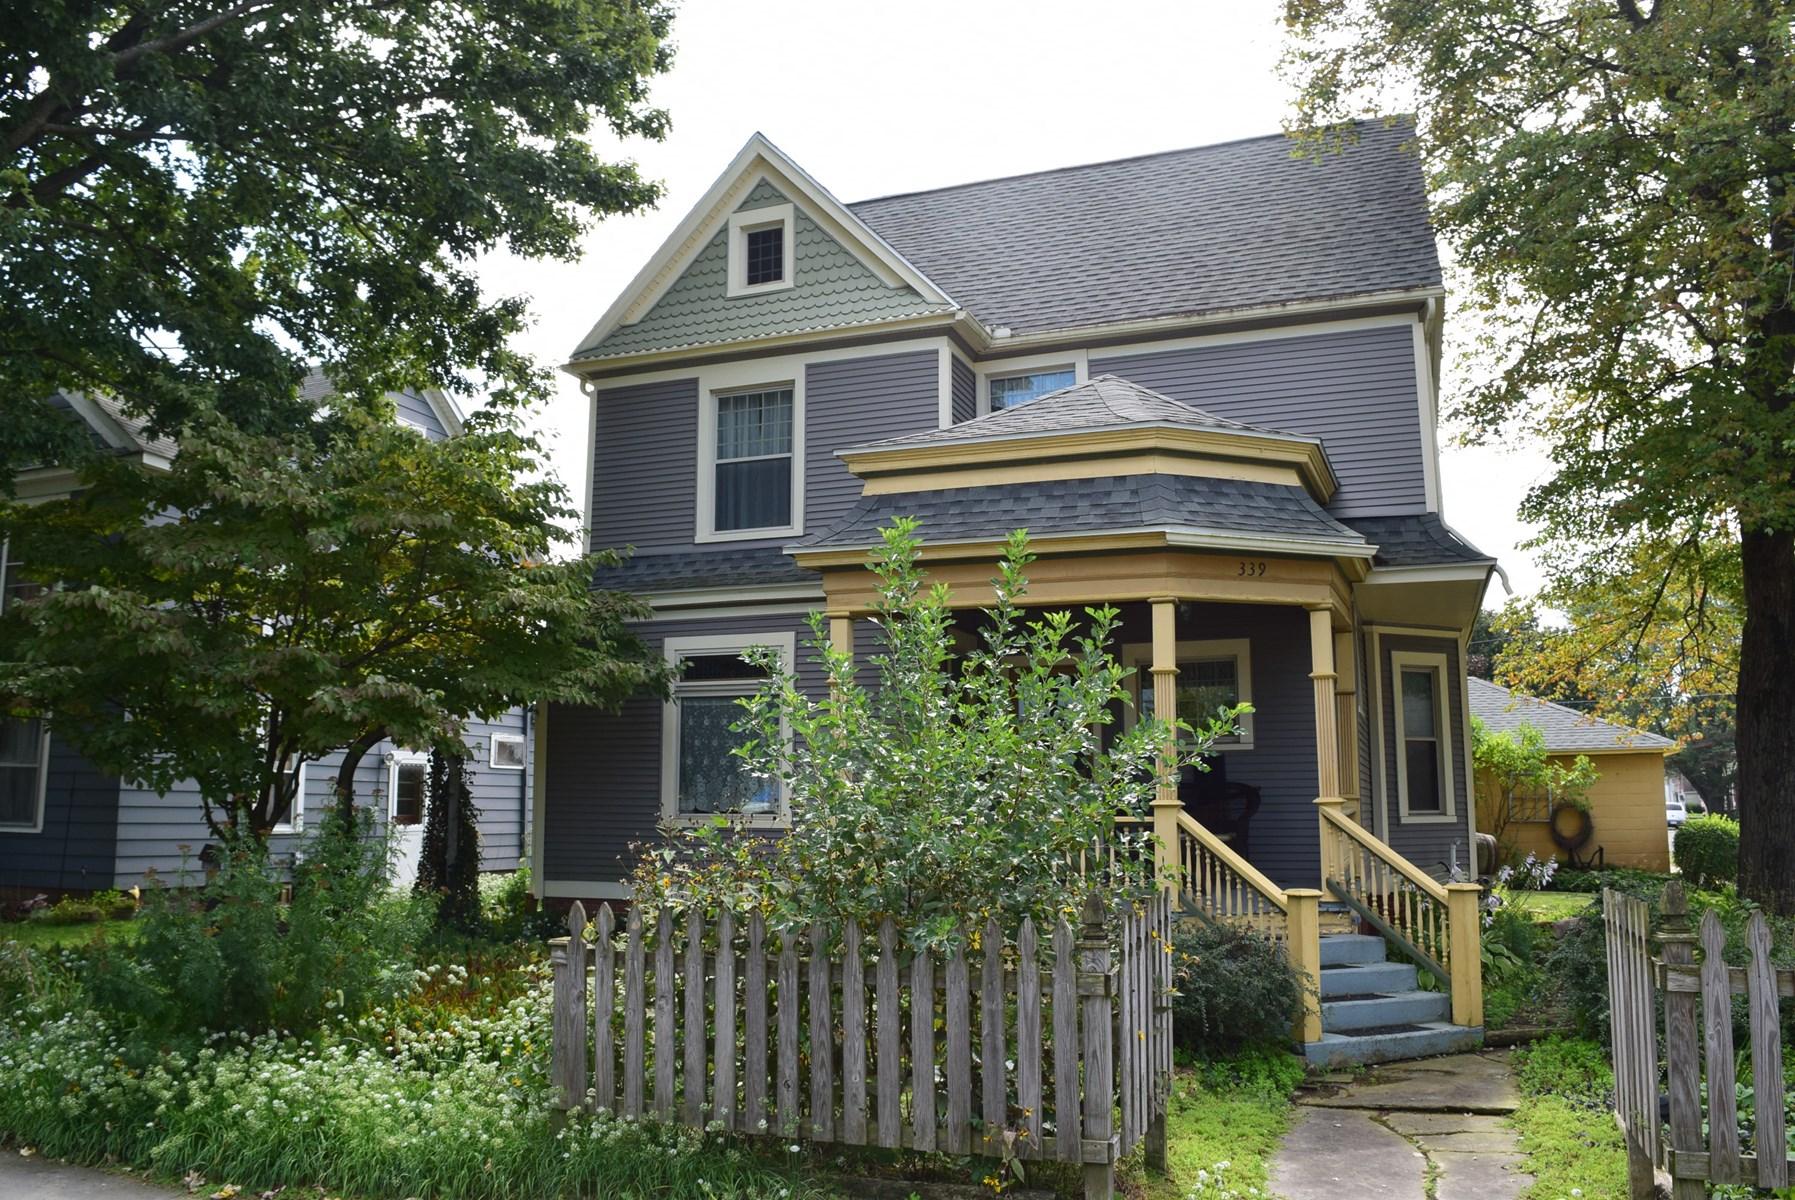 Kuenzli Real Estate Auction - Nov. 2 @ 10am